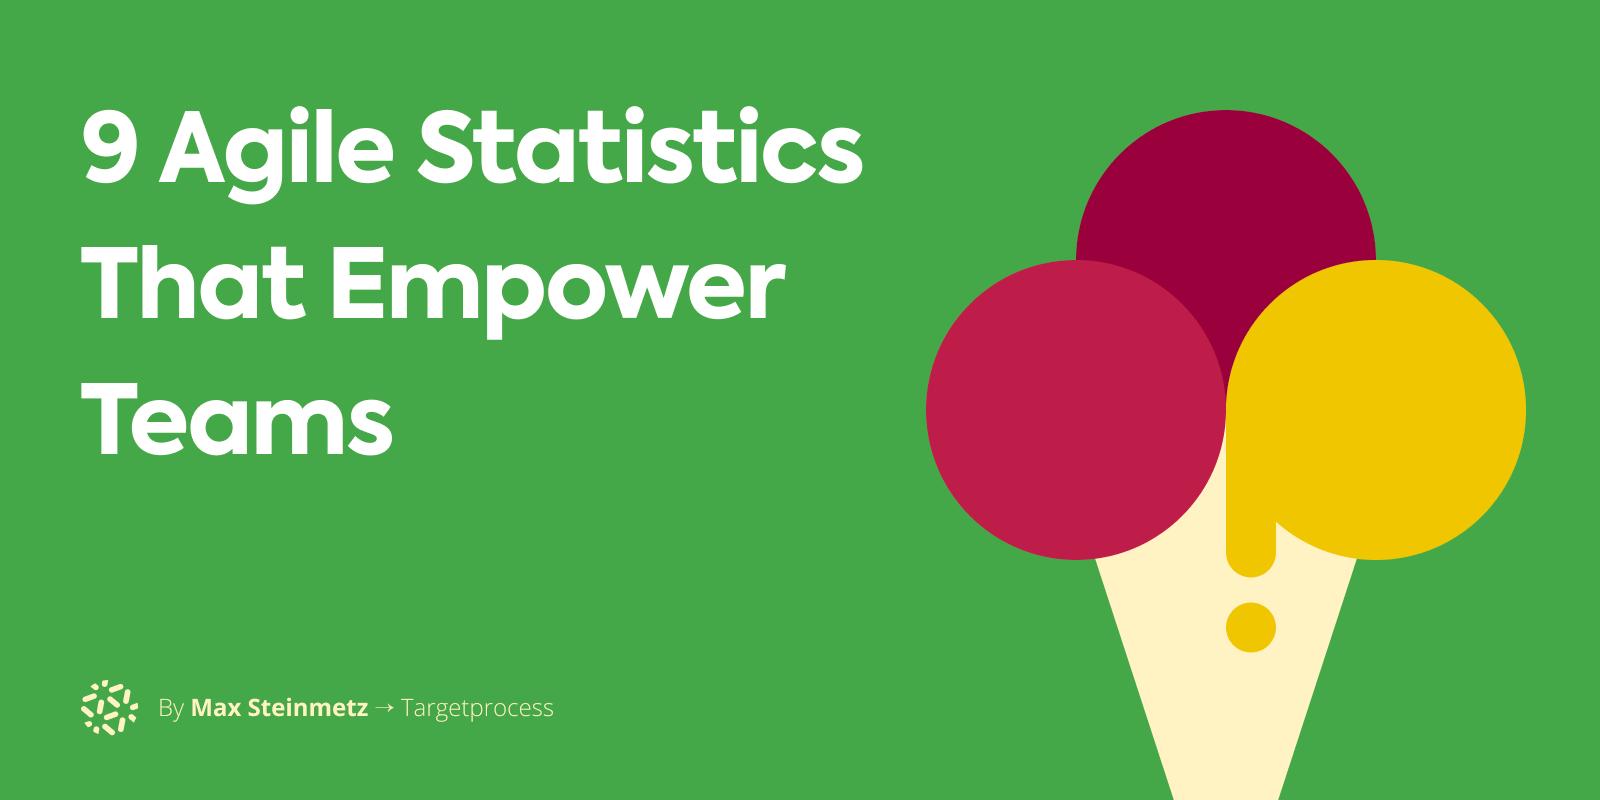 Agile Statistics